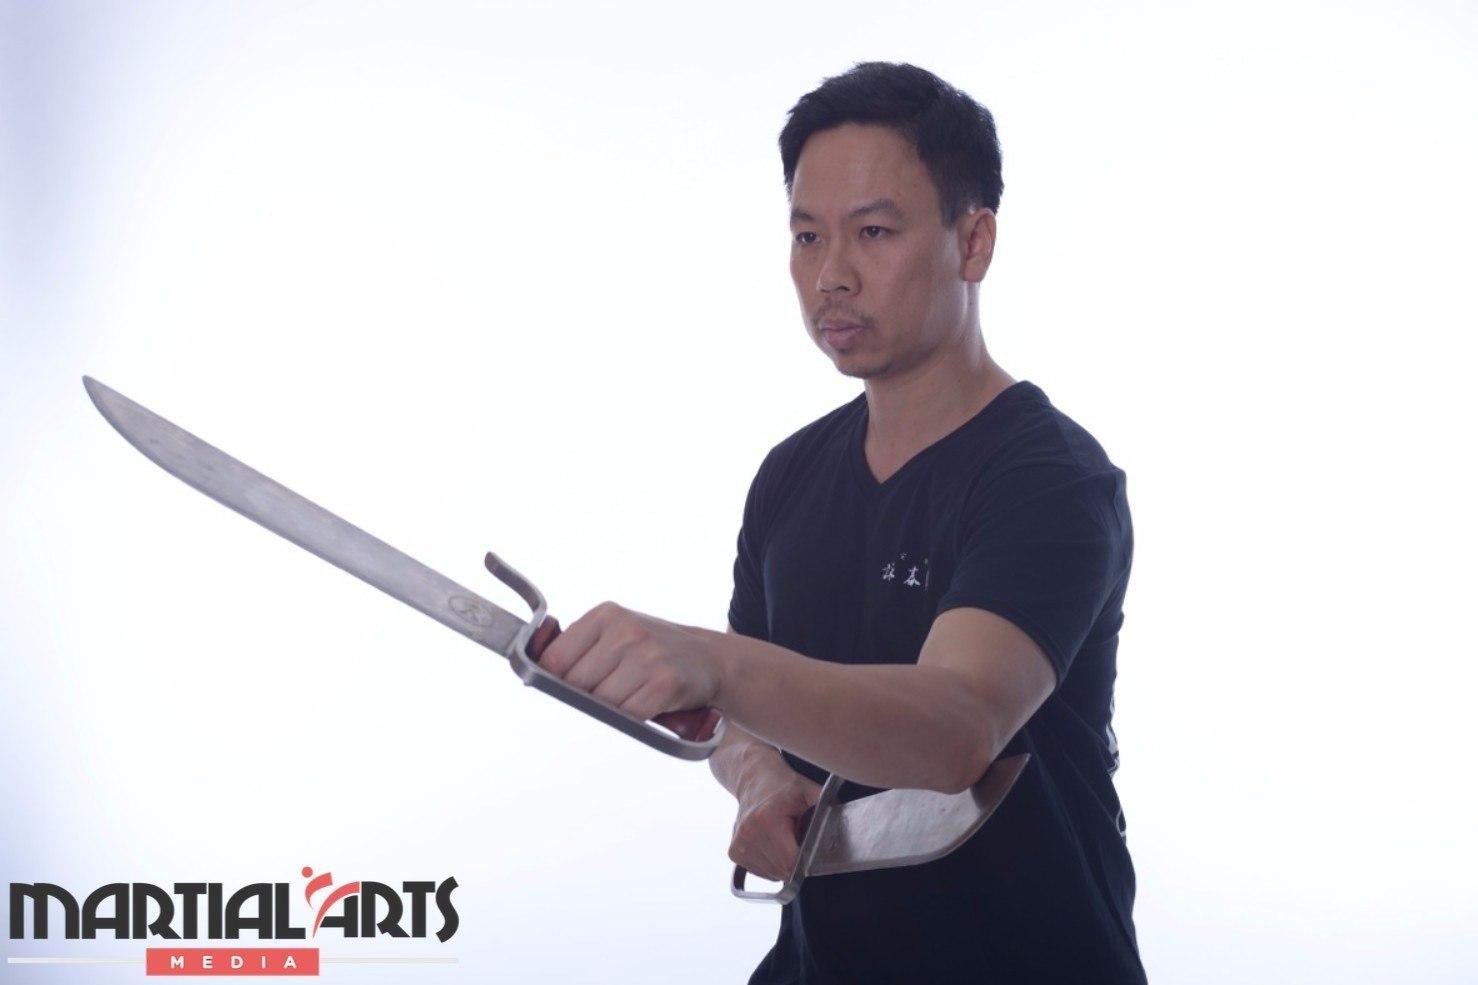 martial arts training videos